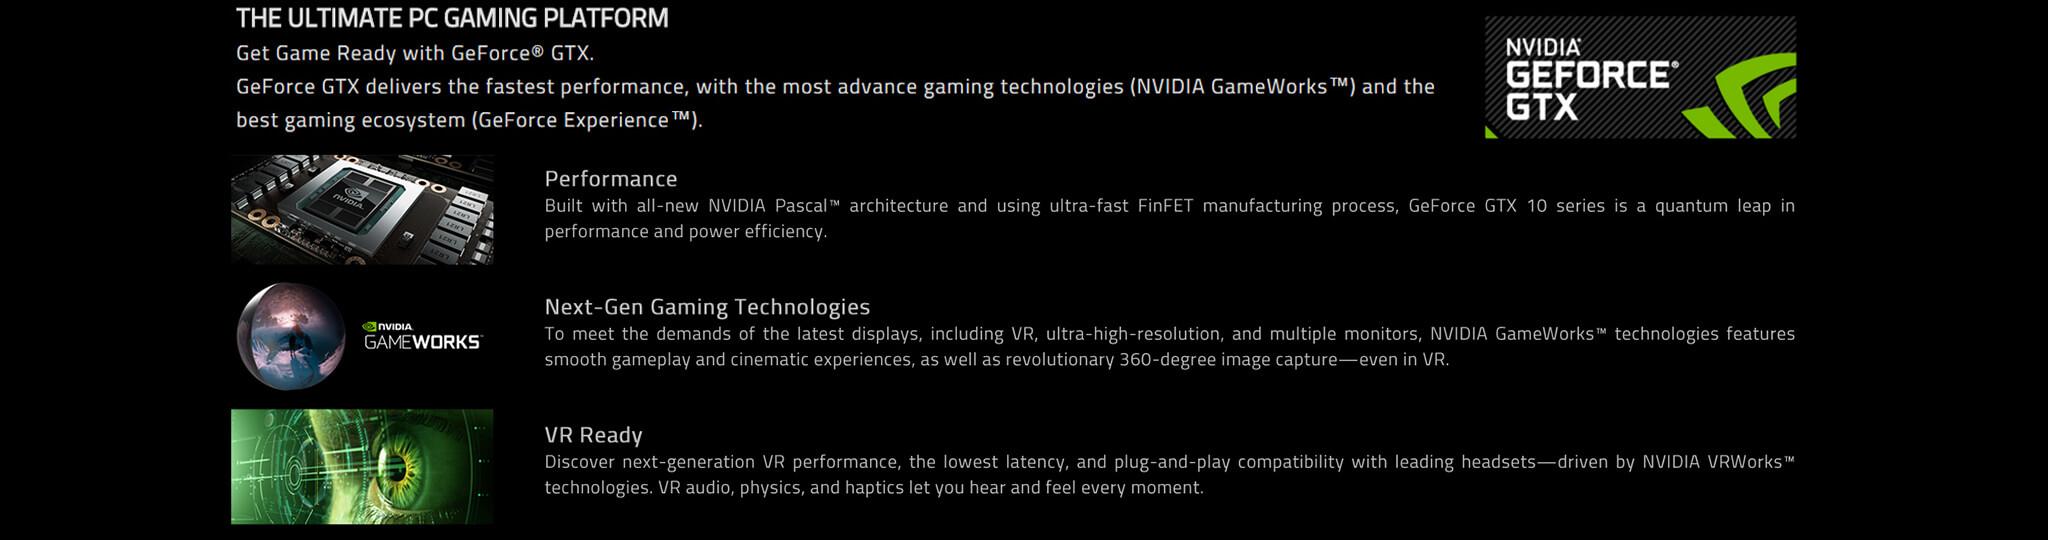 AORUS GeForce® GTX 1070 8G (rev  1 0) | Graphics Card